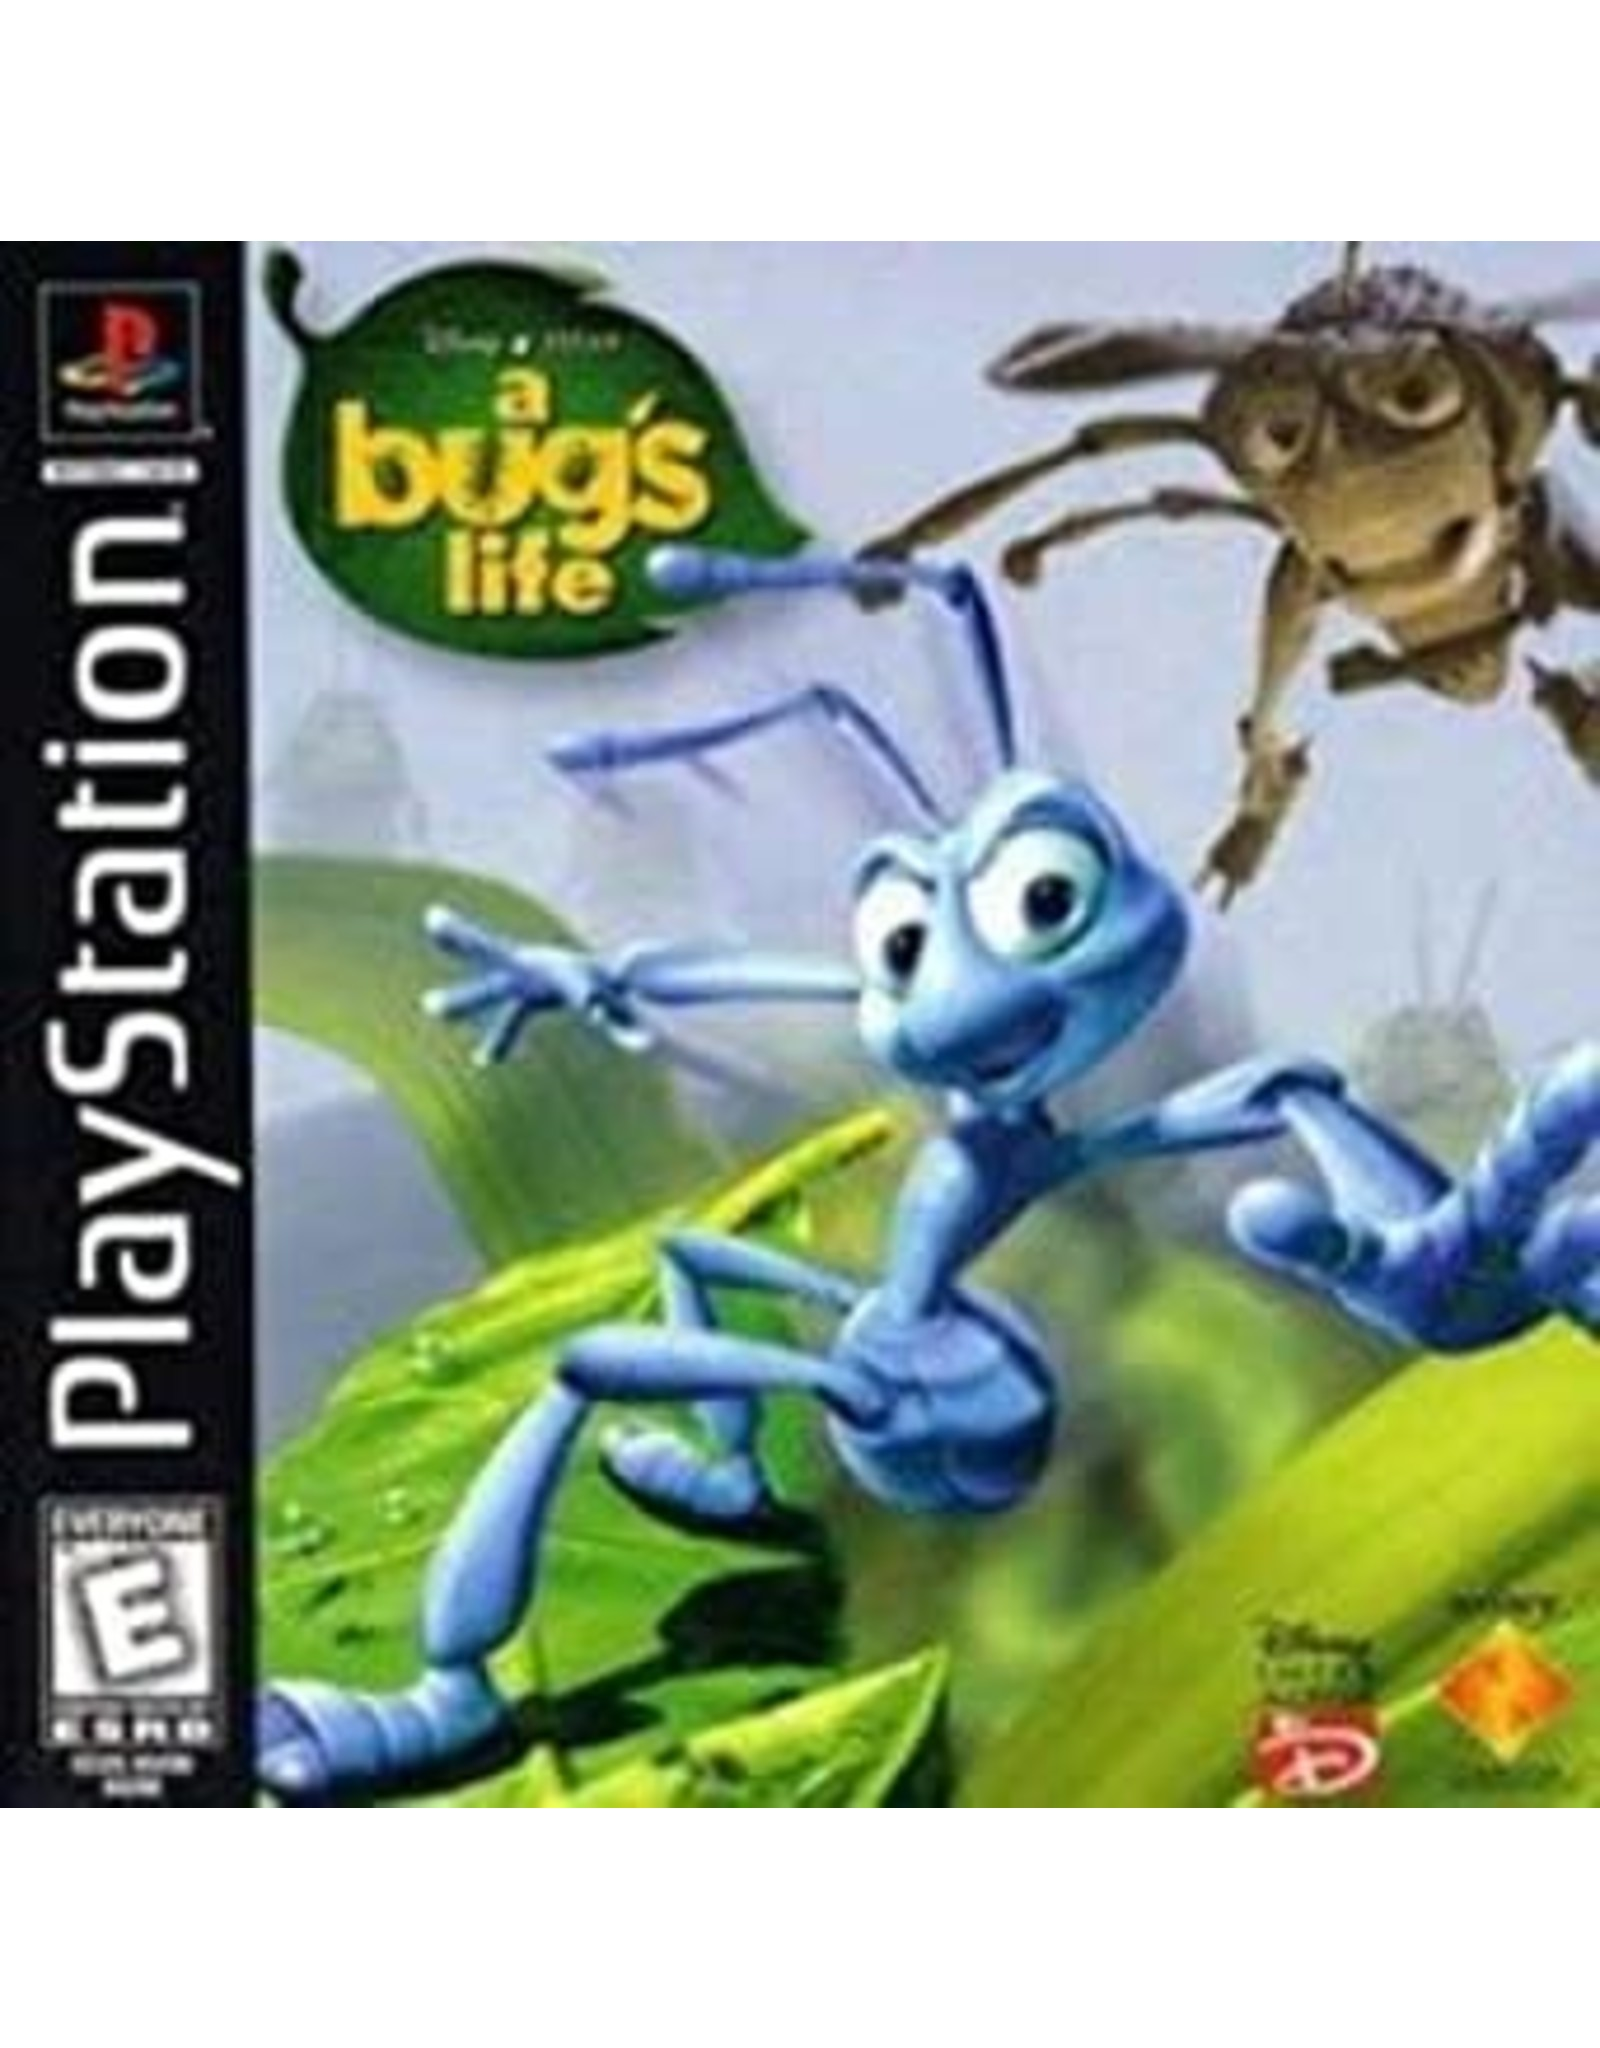 Playstation A Bug's Life (CiB)